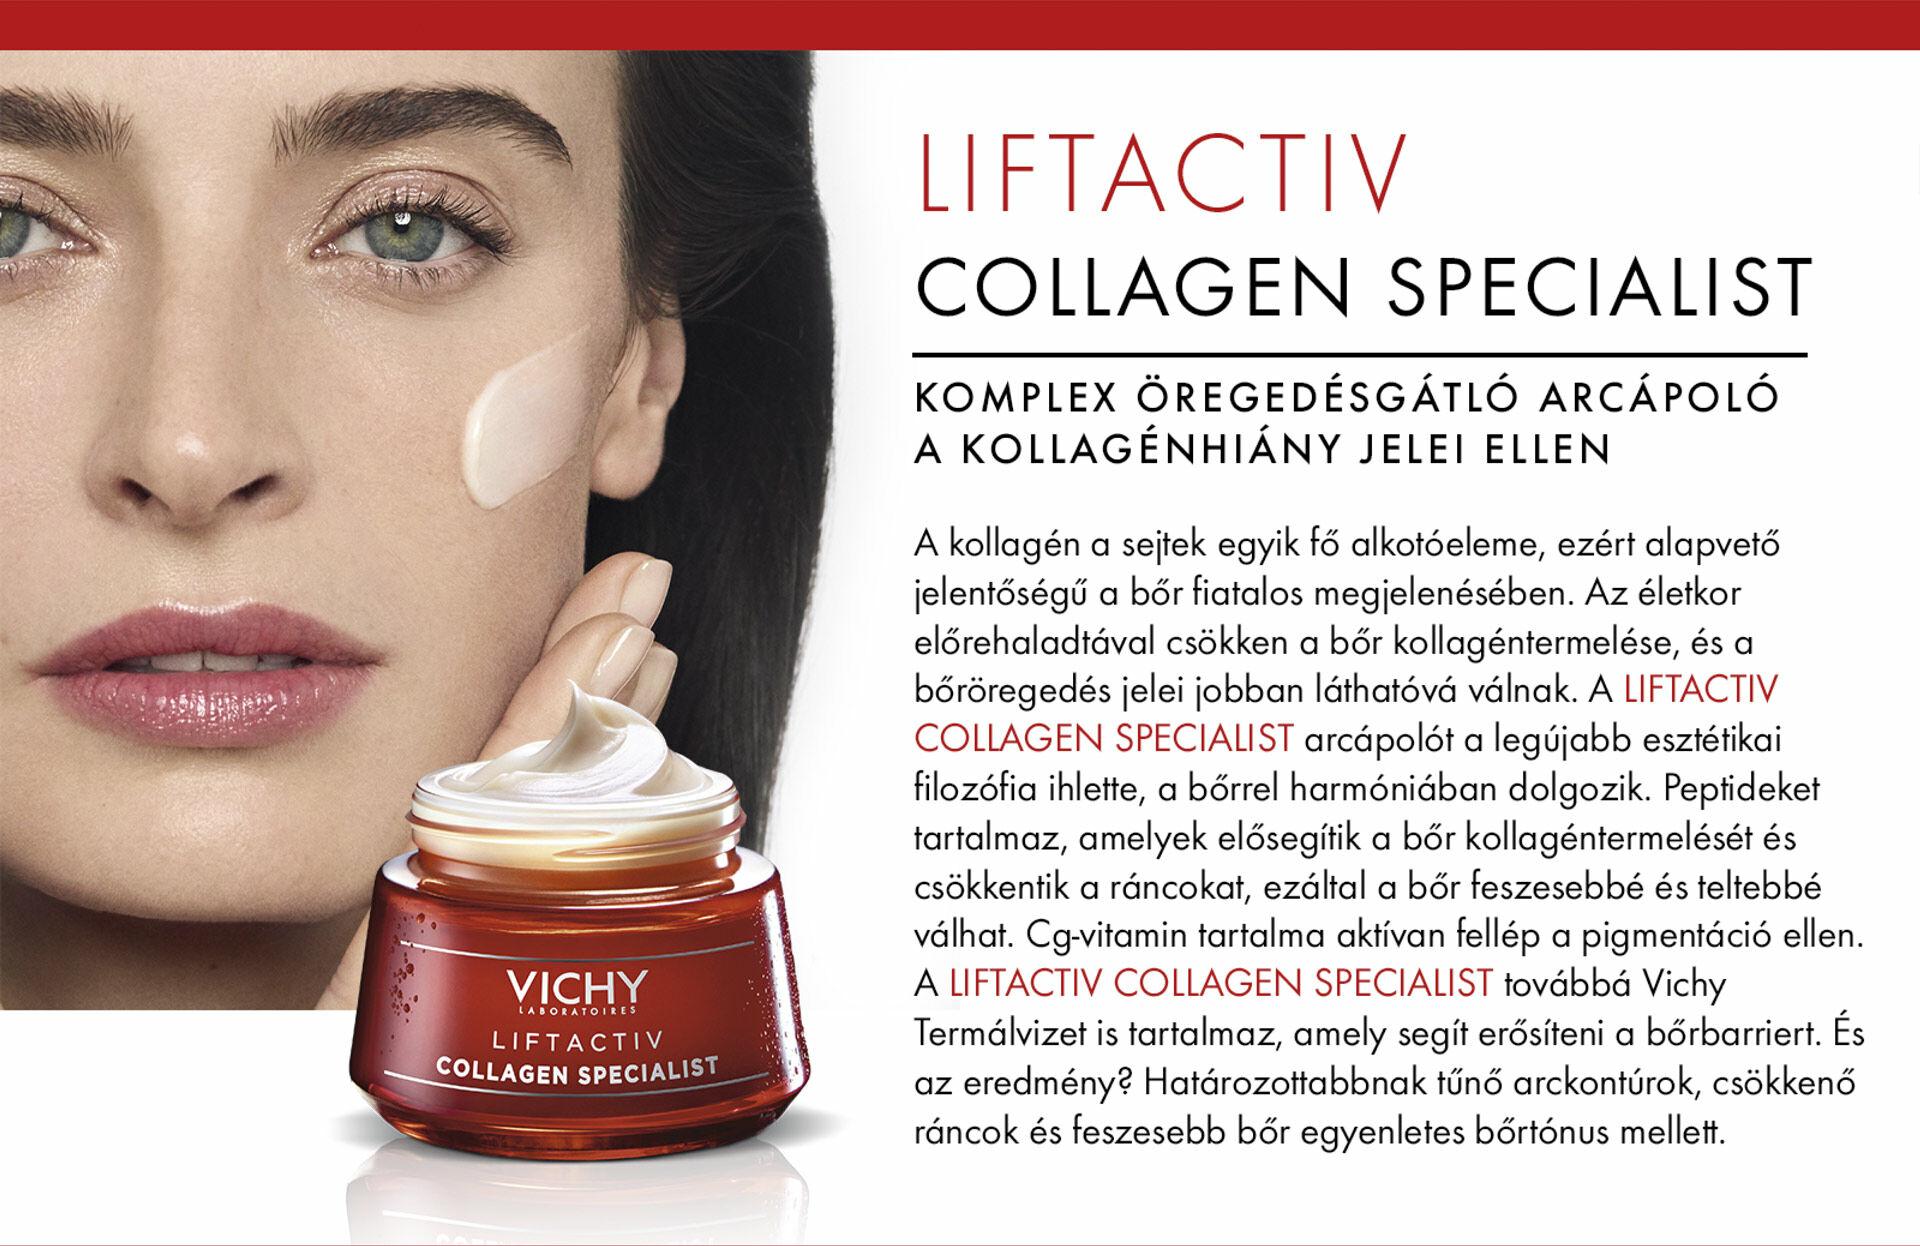 Vichy Liftactiv Collagen Specialist arcápoló